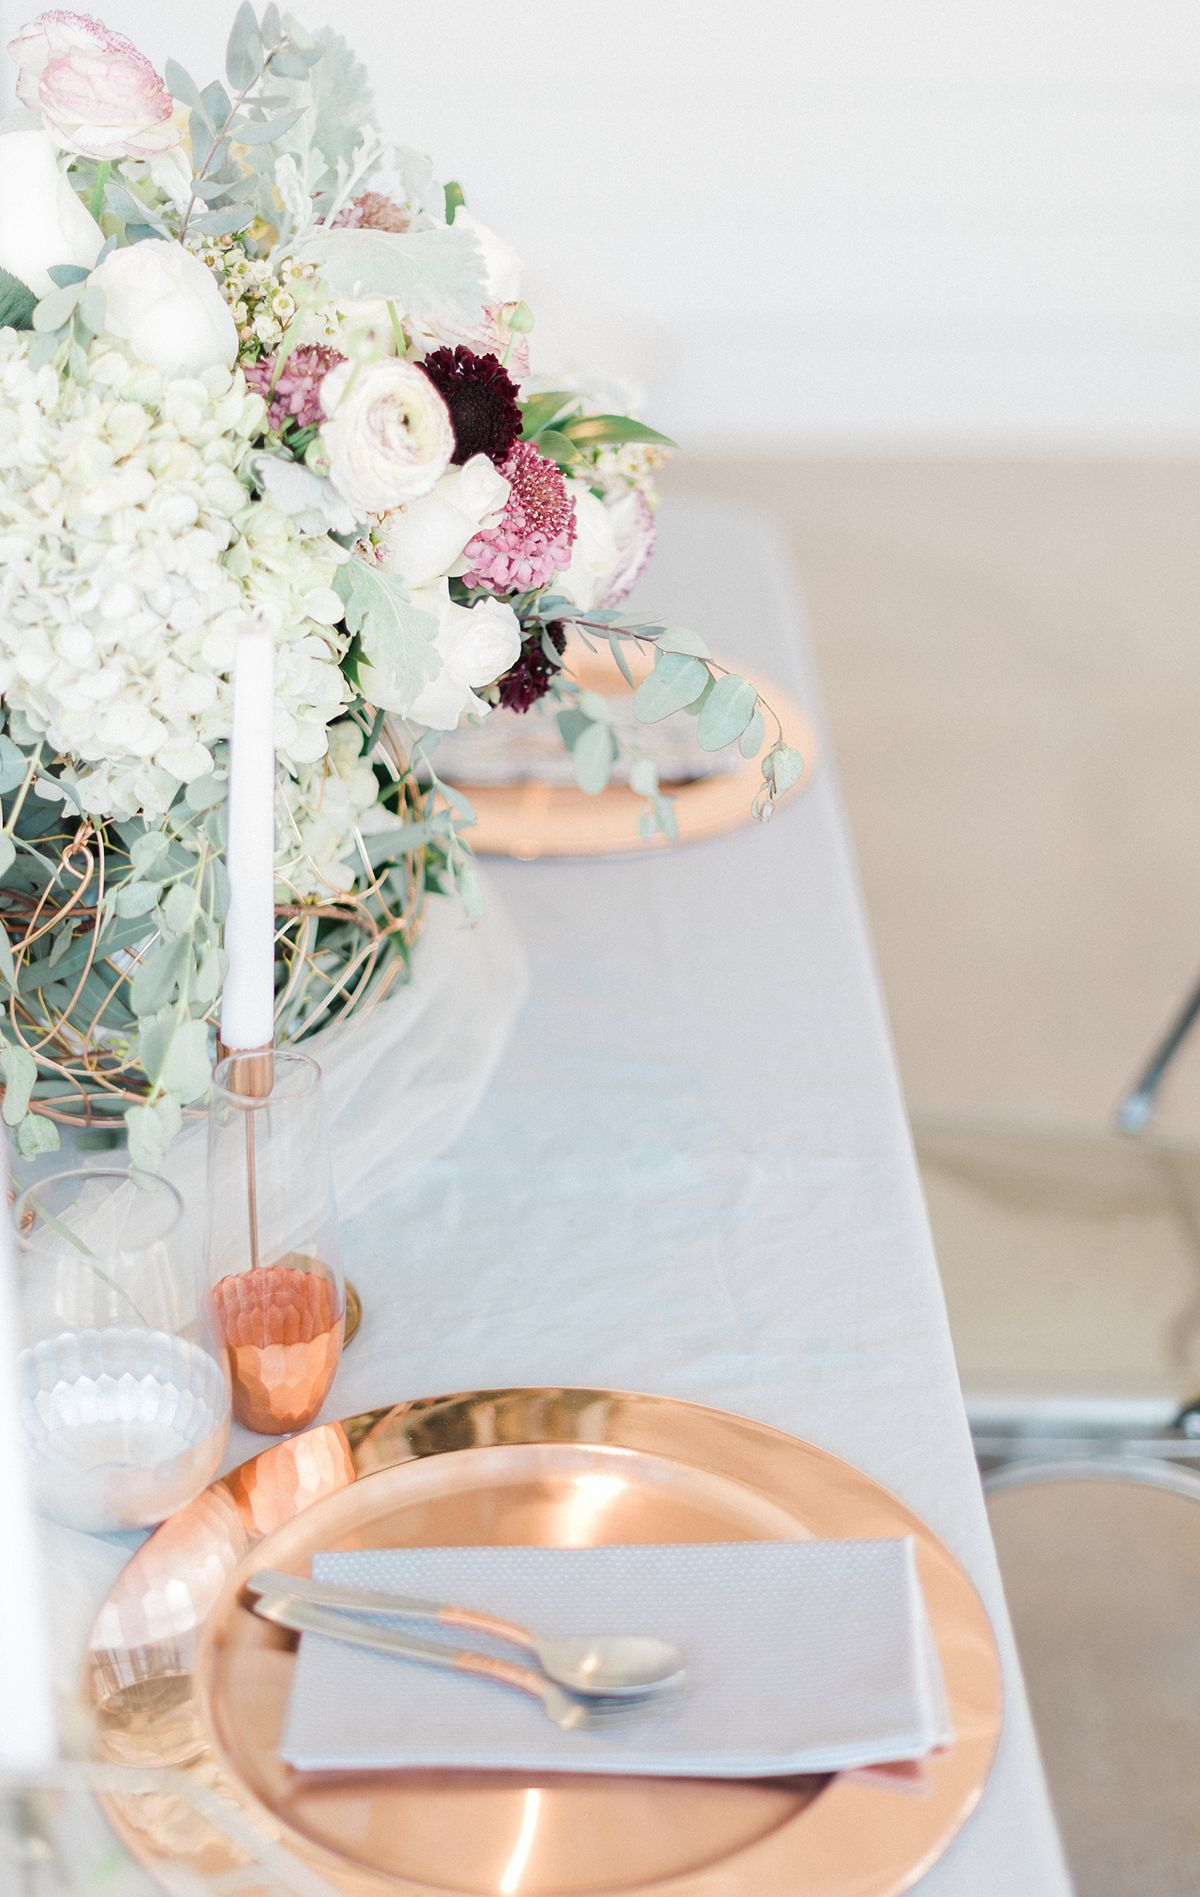 Simple and Romantic Wedding ideas | Wedding tables, Weddings and Wedding